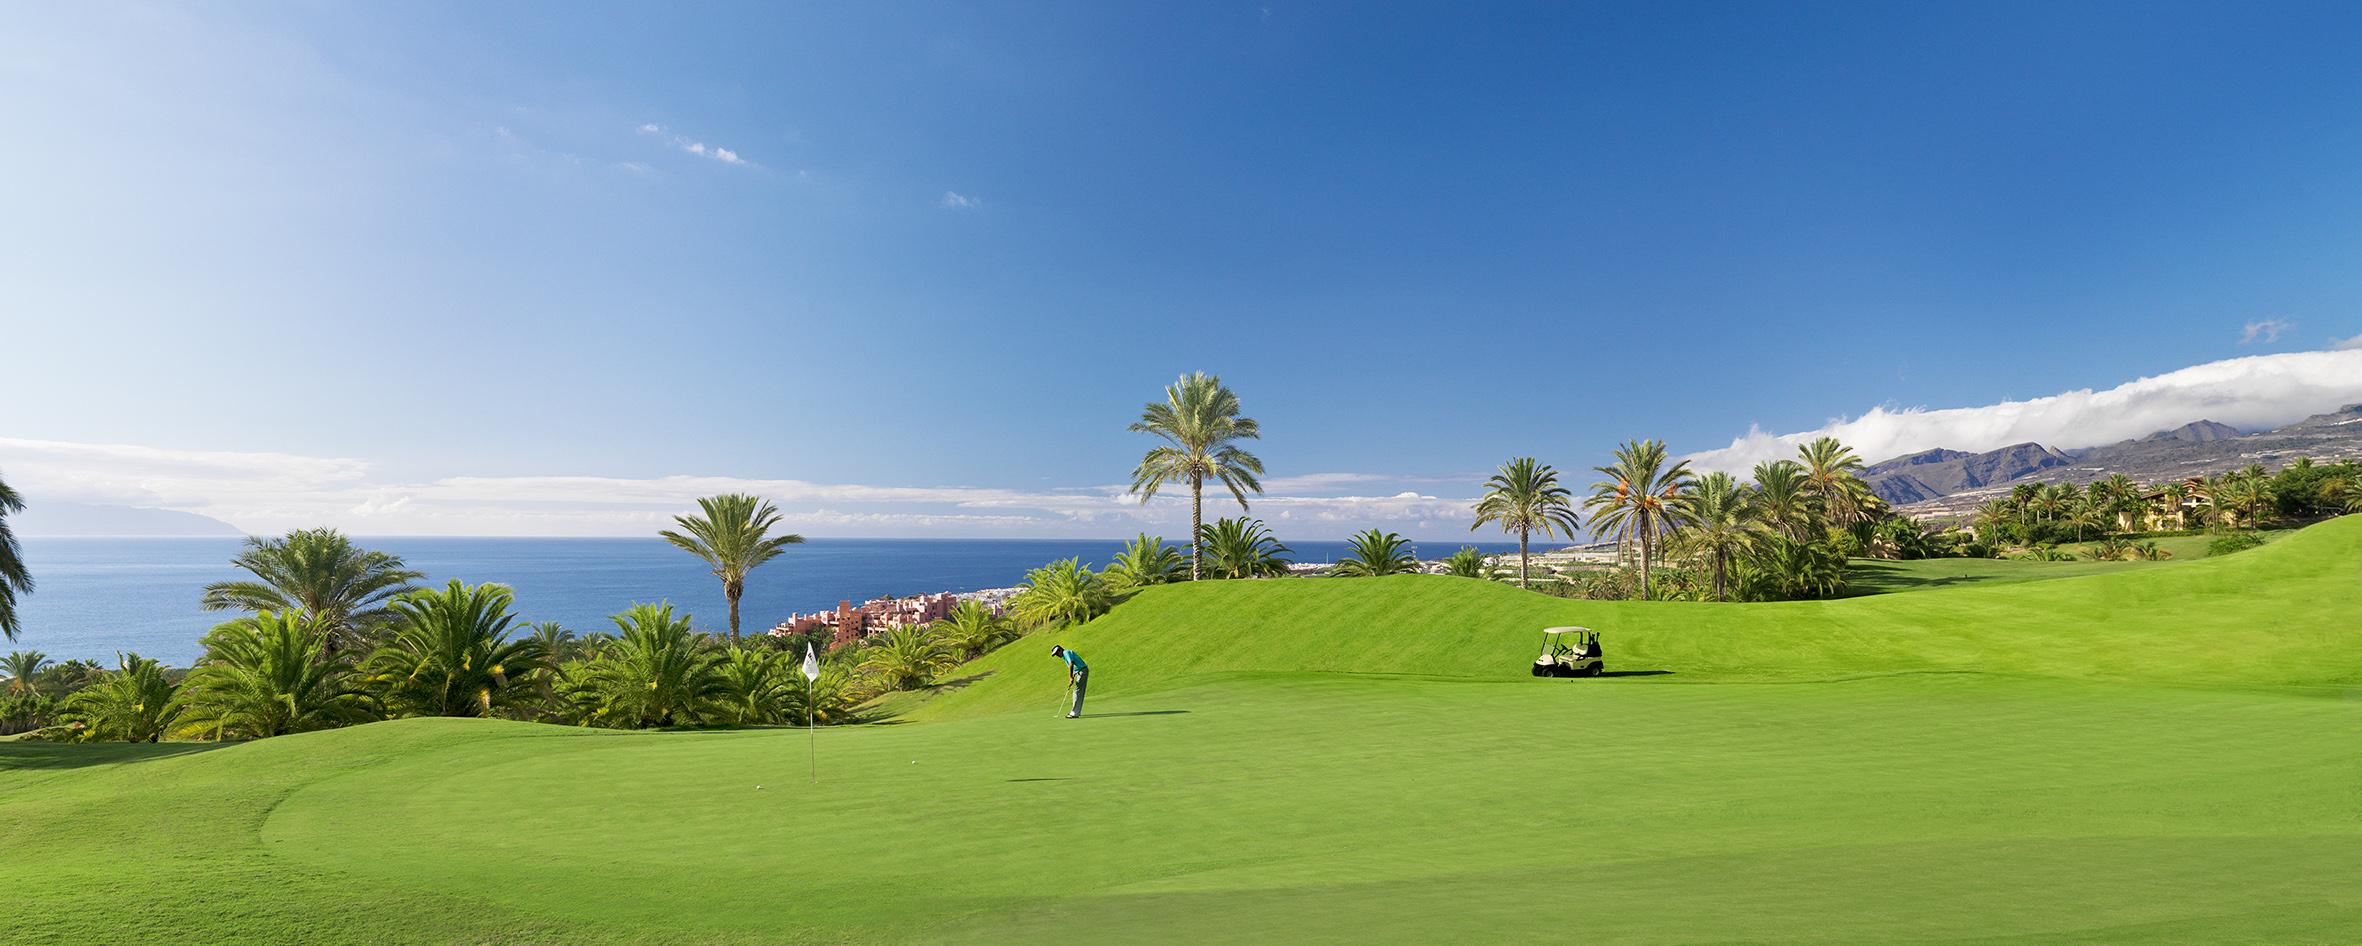 golf_course-generic-landscape